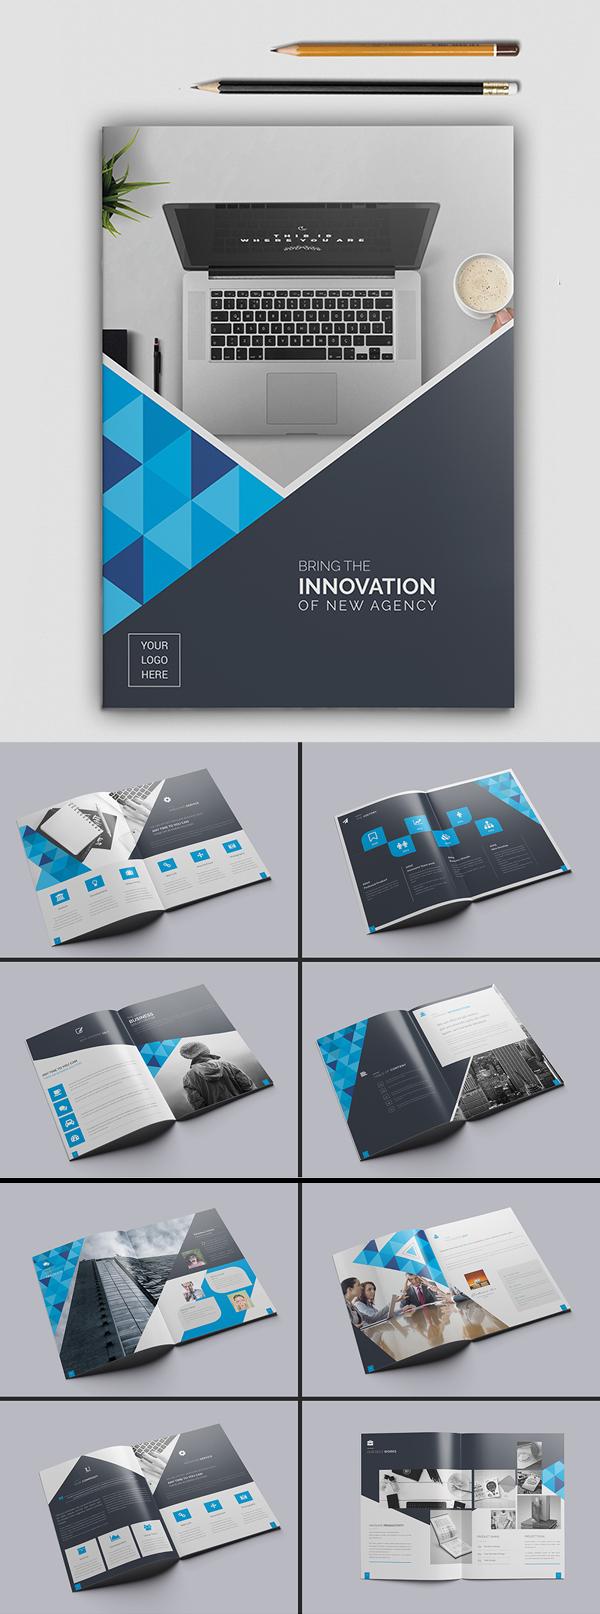 100 Professional Corporate Brochure Templates - 2